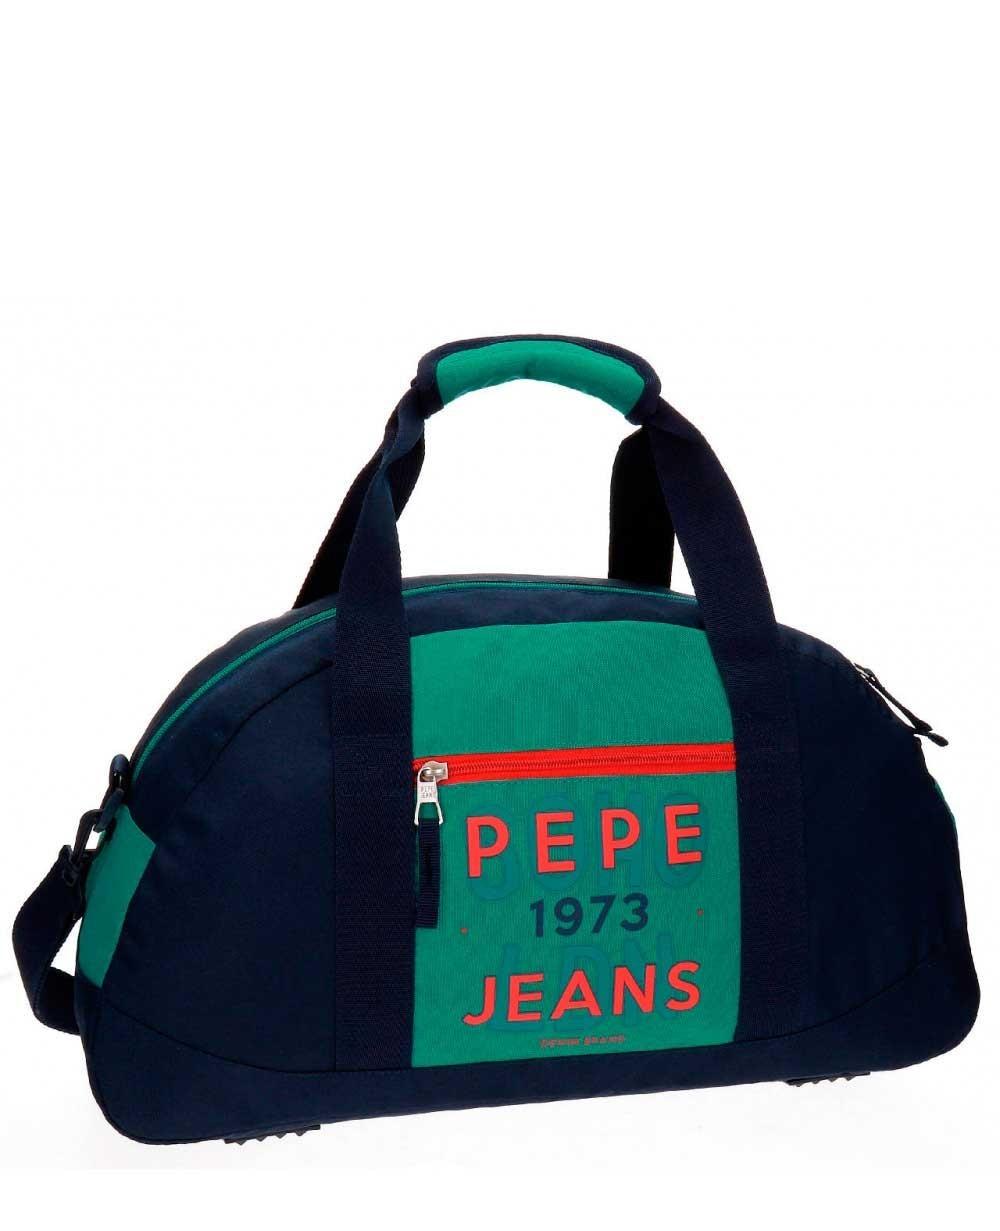 Pepe Jeans Reed Bolsa de Viaje Azul (Foto )